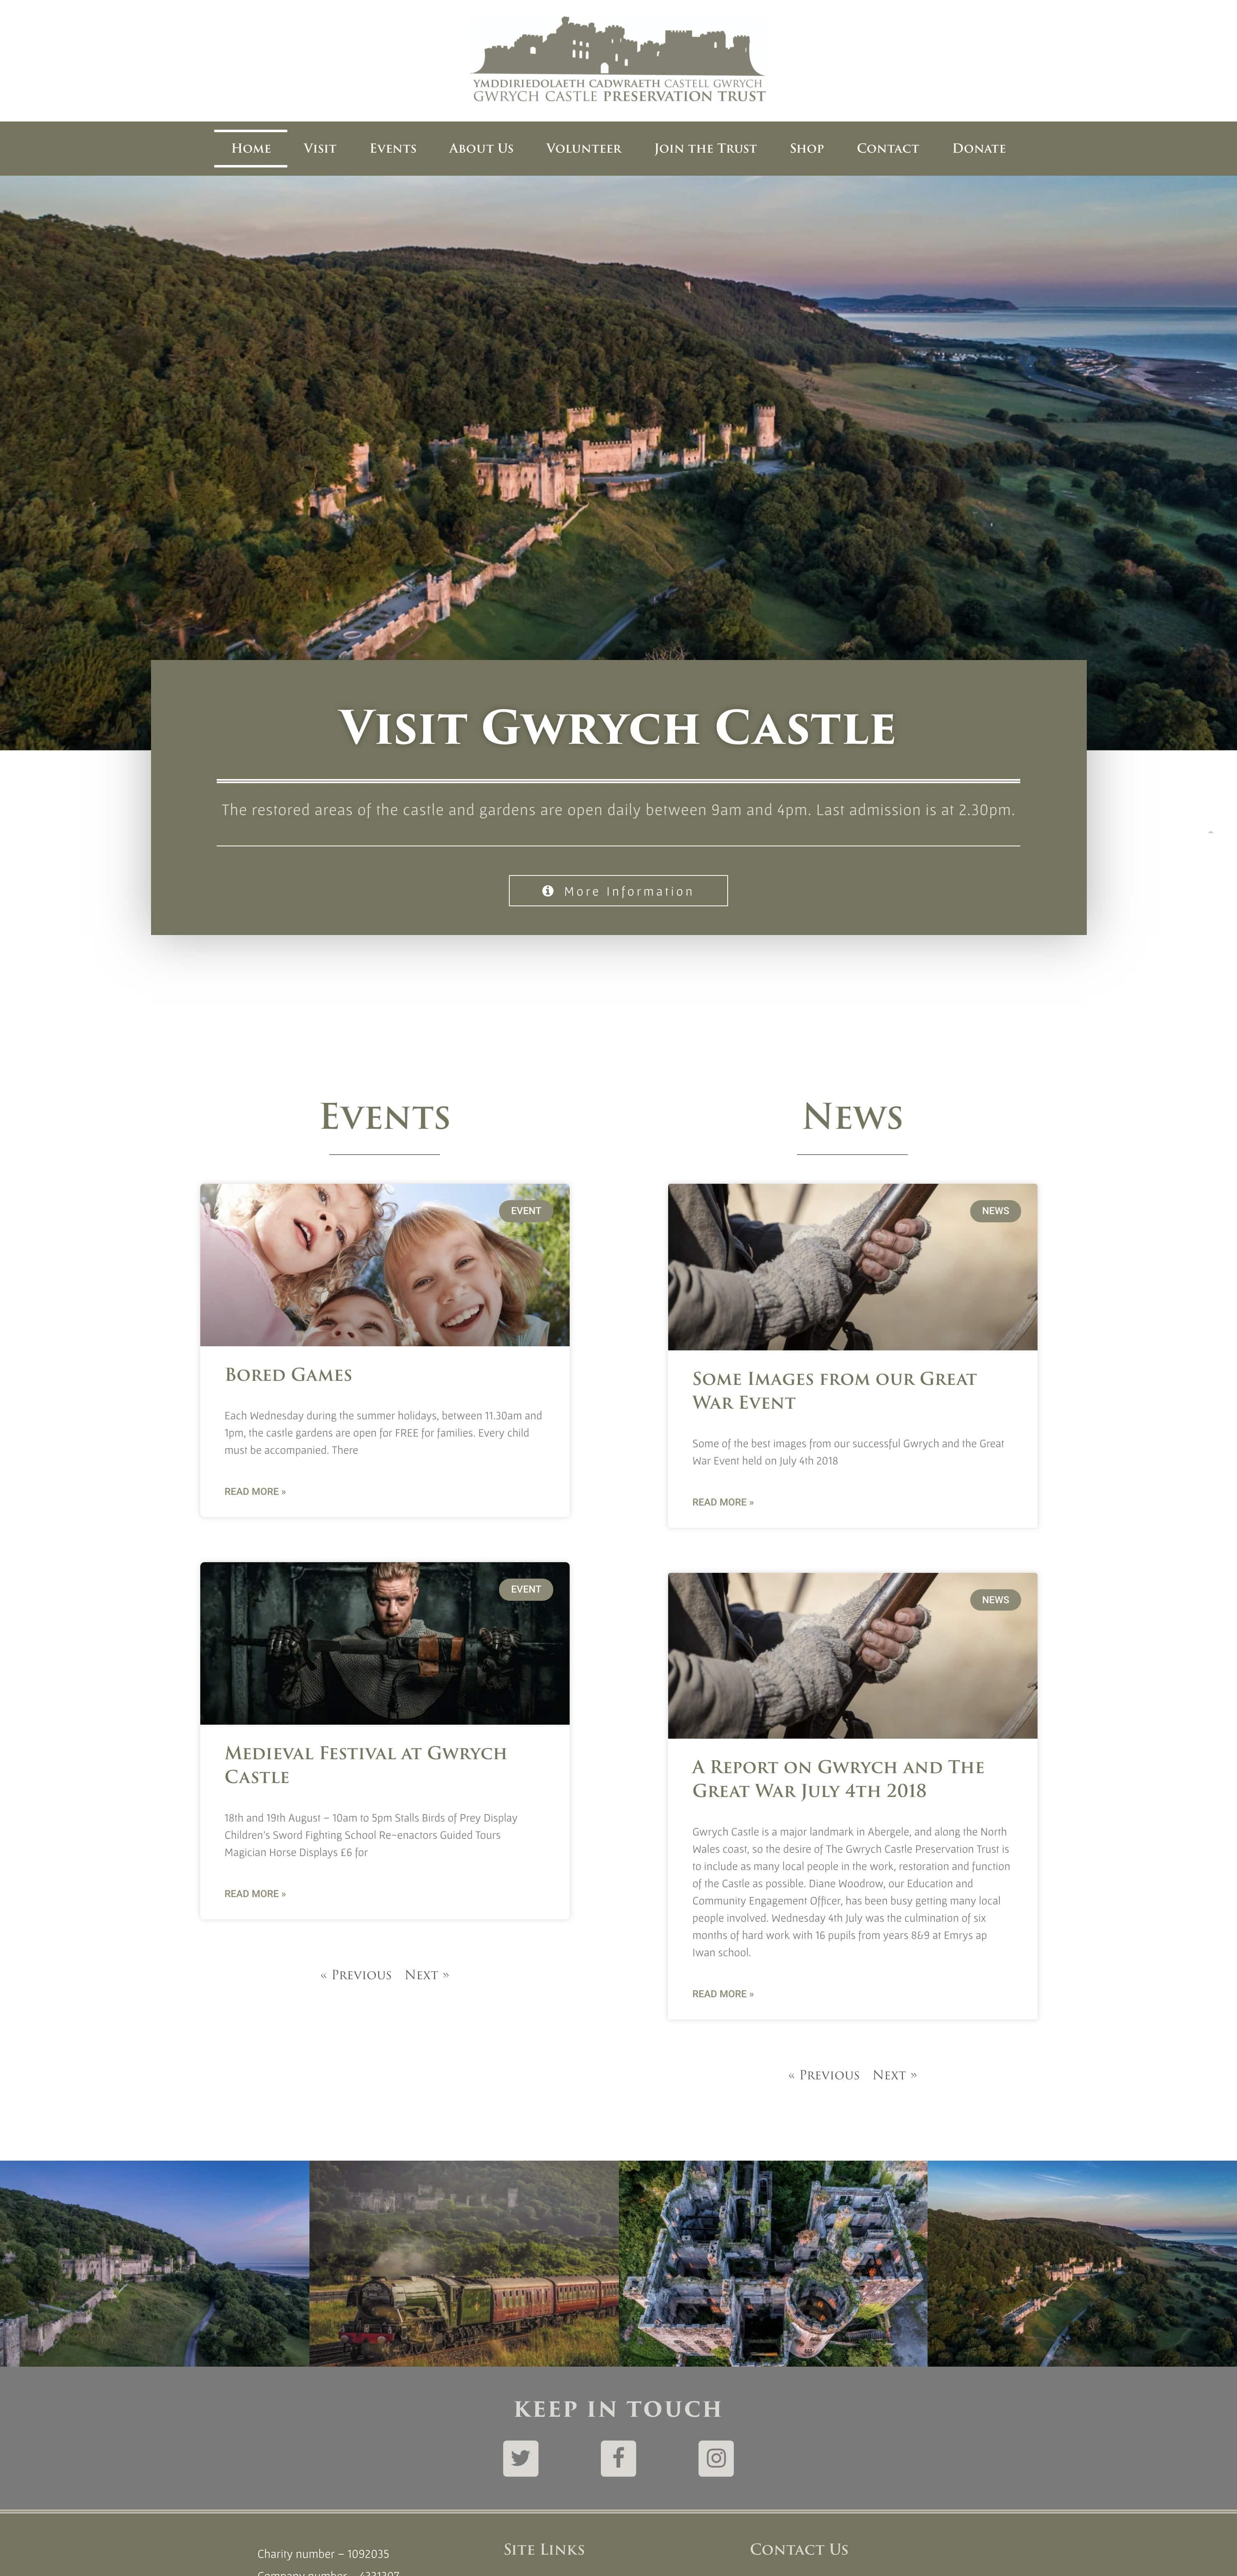 Gwrych Castle Website